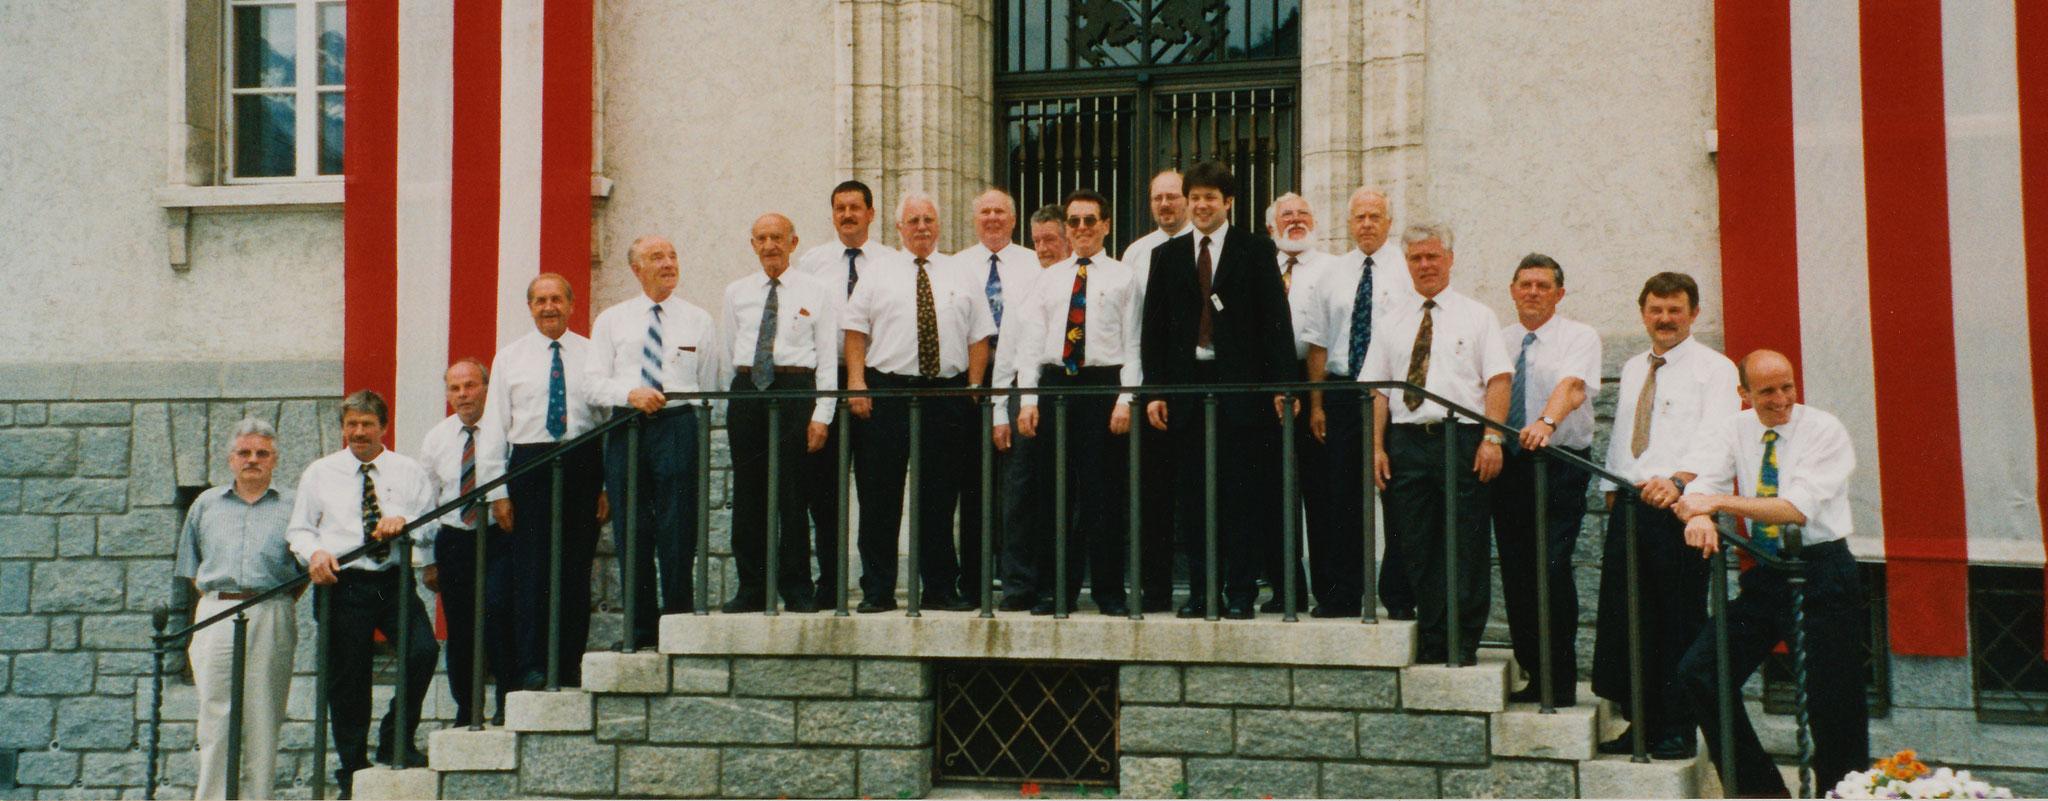 Eidg. Sängerfest Visp 2000